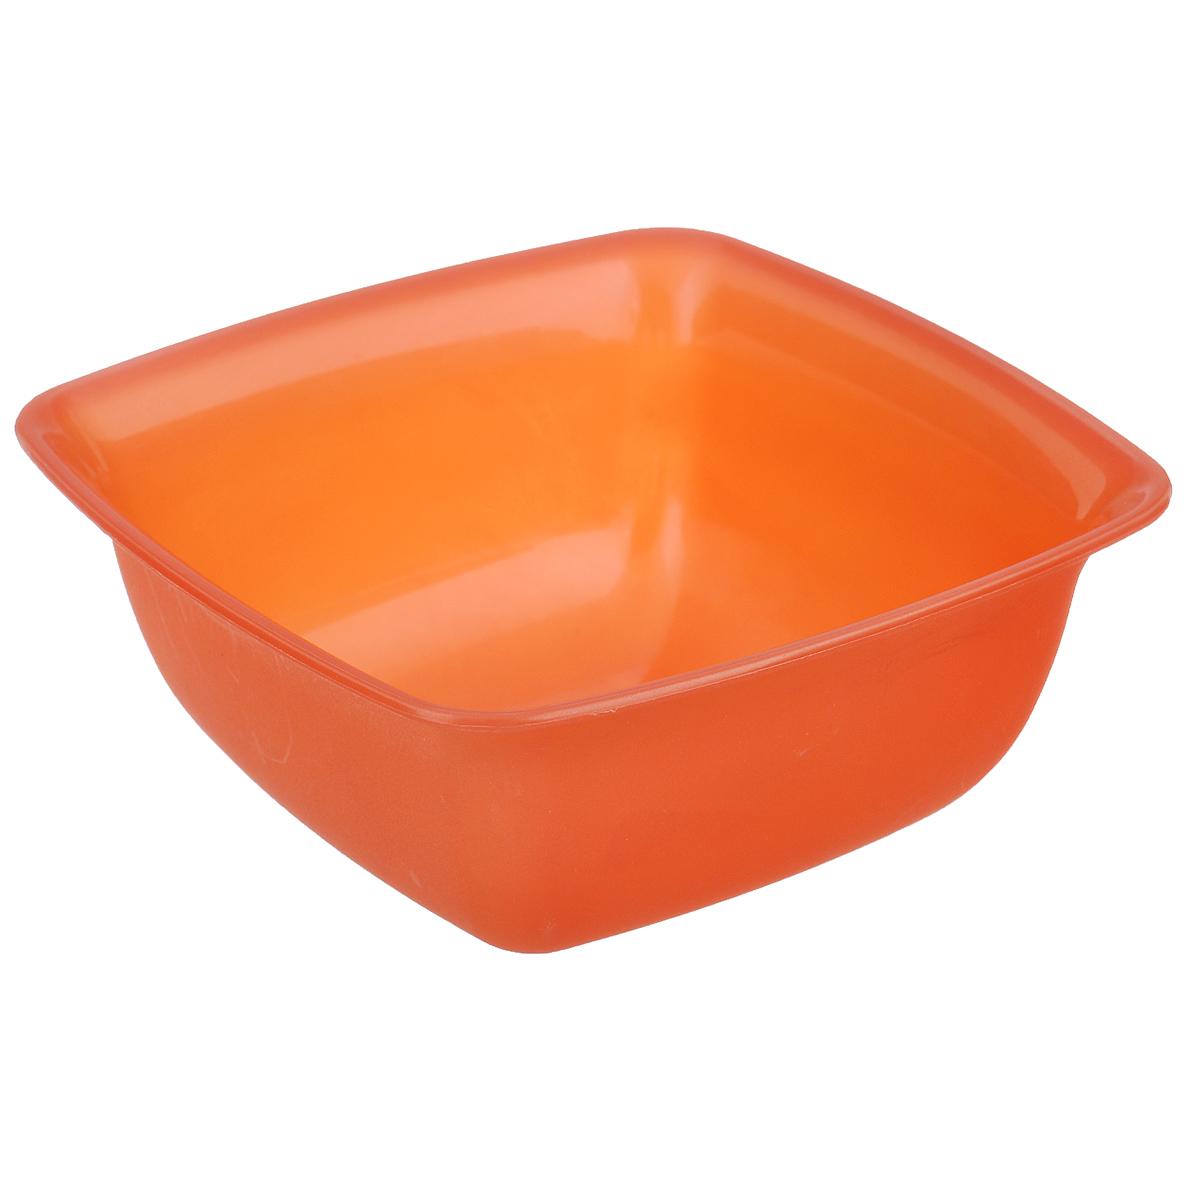 ����� Dunya Plastik, ����������, ����: ���������, 600 �� - Dunya Plastik10171 �������������� Dunya Plastik ����������� �� �������� �������� ���������� �����. ����� ������� ������� ������ � ���������� ���������. ������� ����� ��������������, ��� ���������� �� ����� ��� ����� ������������� ����: � �������� ���������, �����, �������. ����� ���� � ������������� ������. �����: 600 ��. ������ ����� (�� �������� ����): 13,5 �� � 13,5 ��. ������ ������: 6 ��.